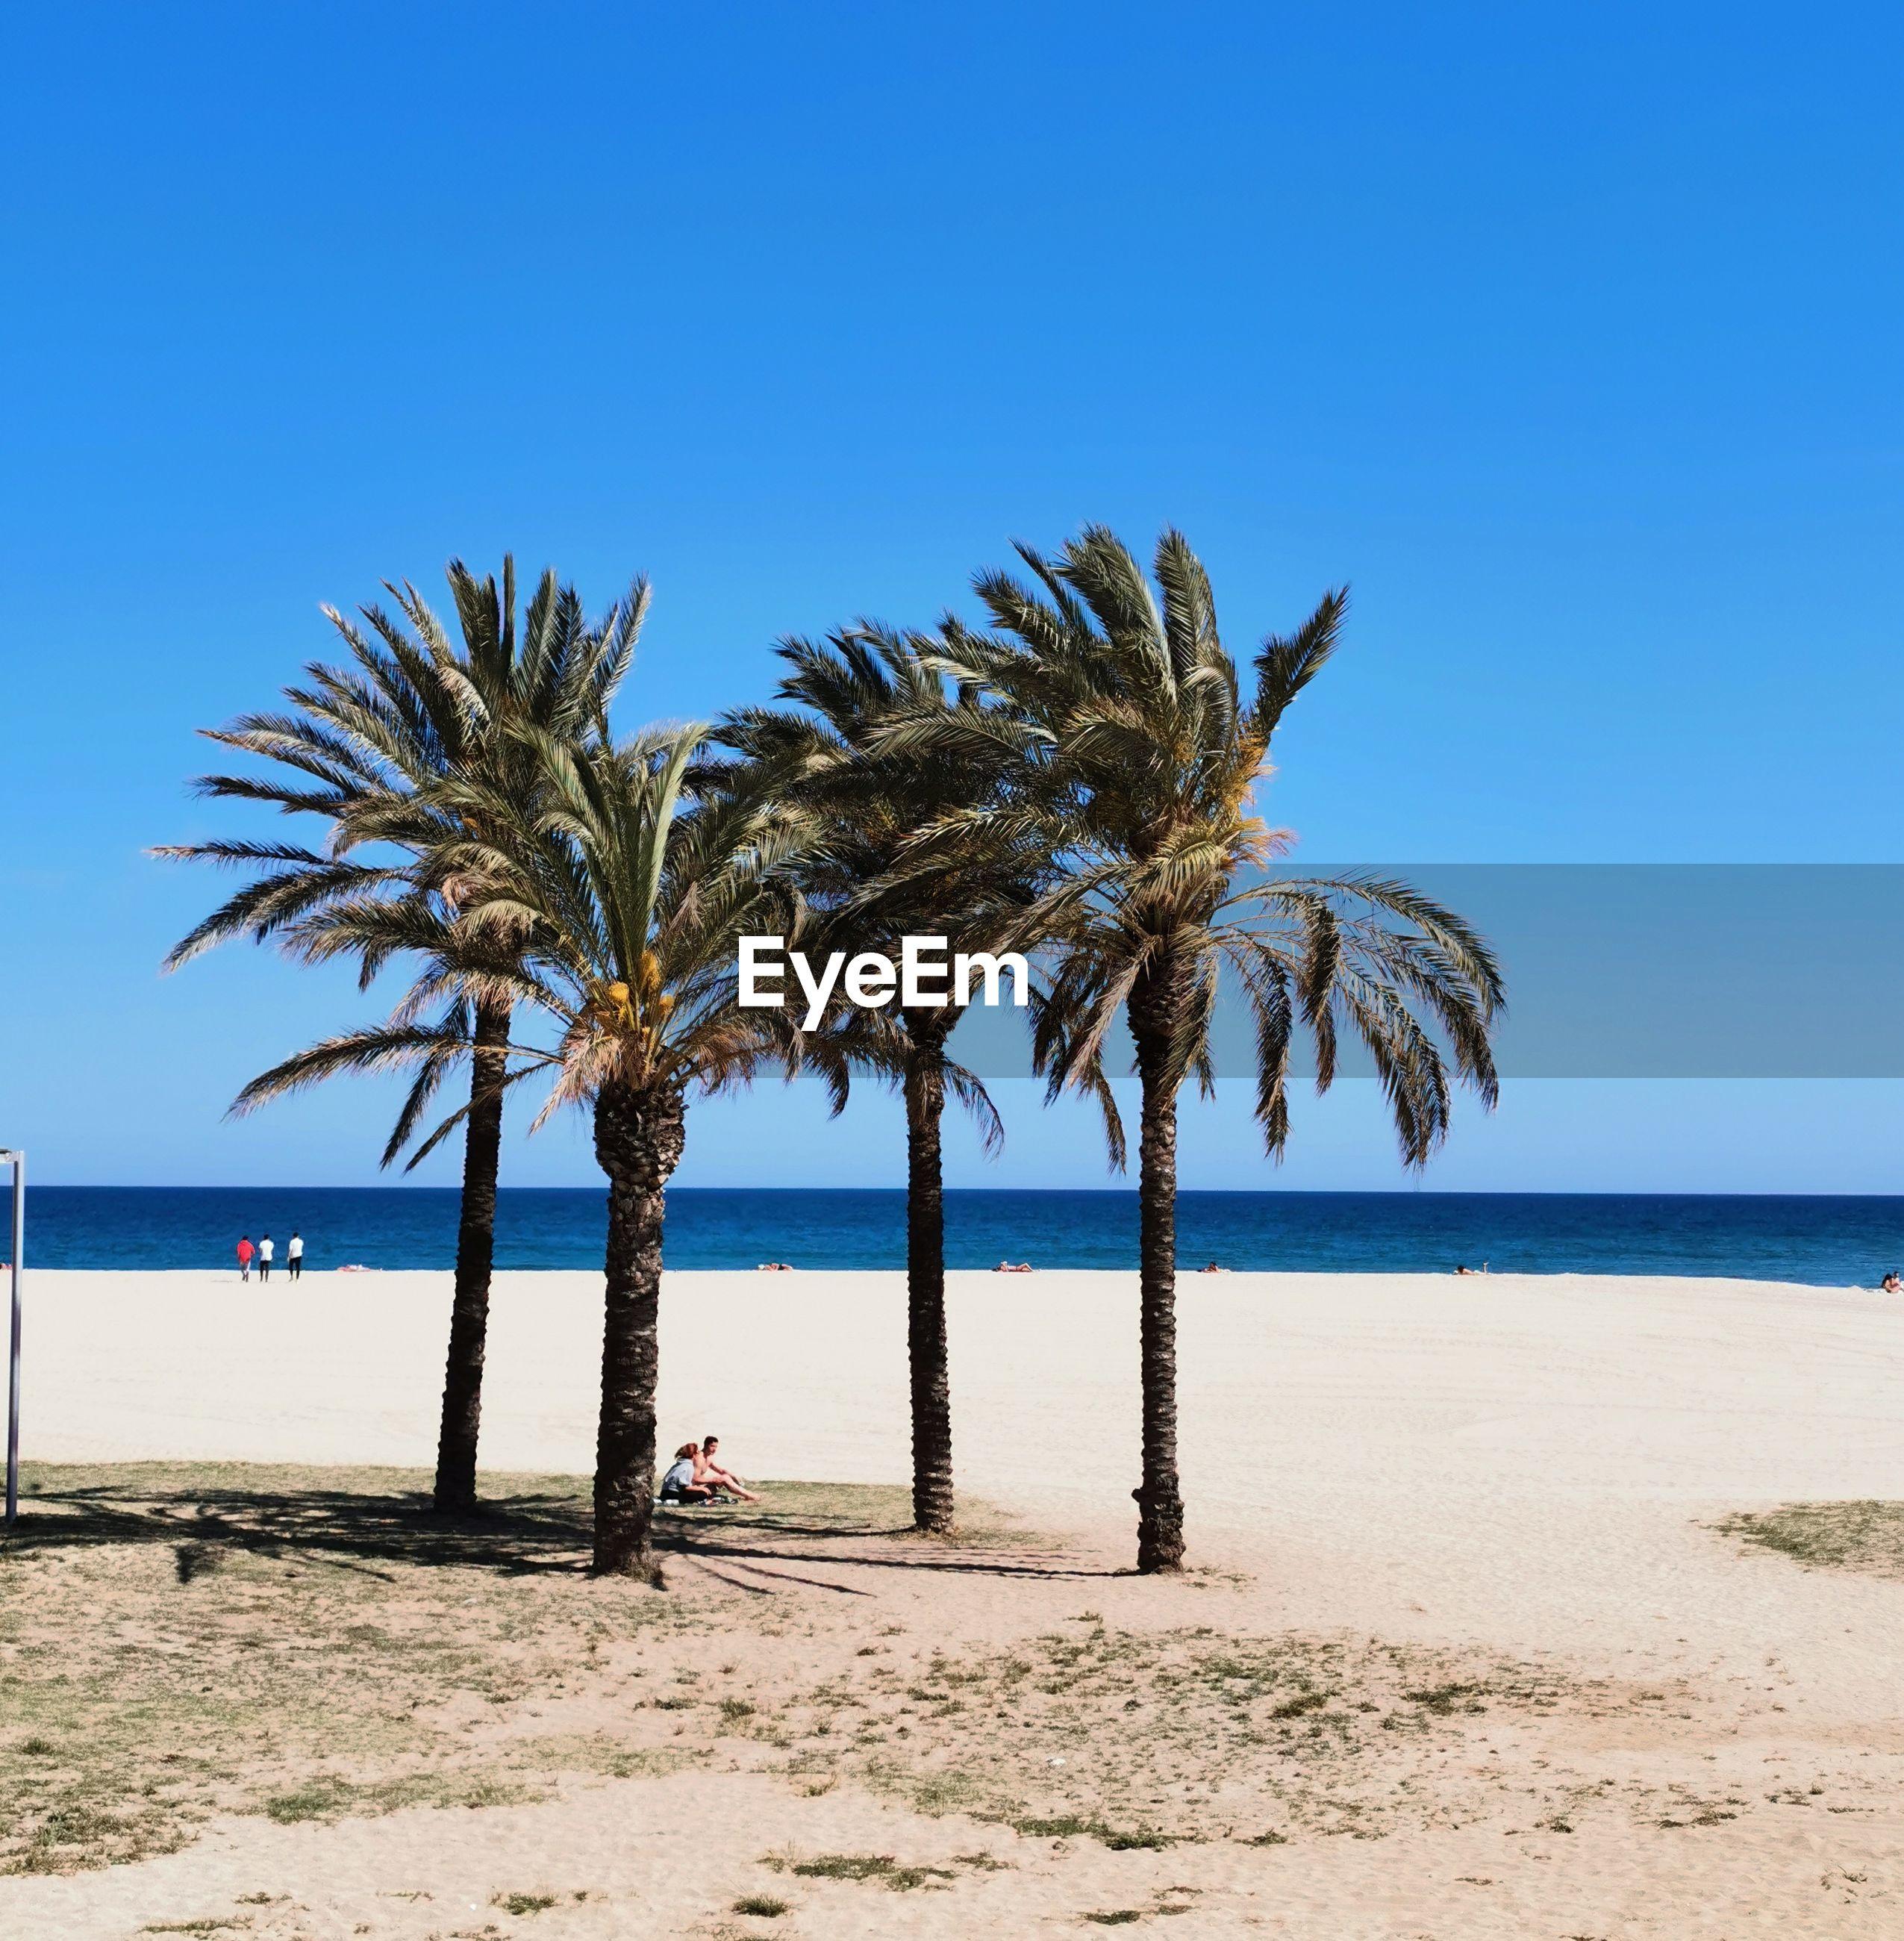 PALM TREES AT BEACH AGAINST CLEAR BLUE SKY